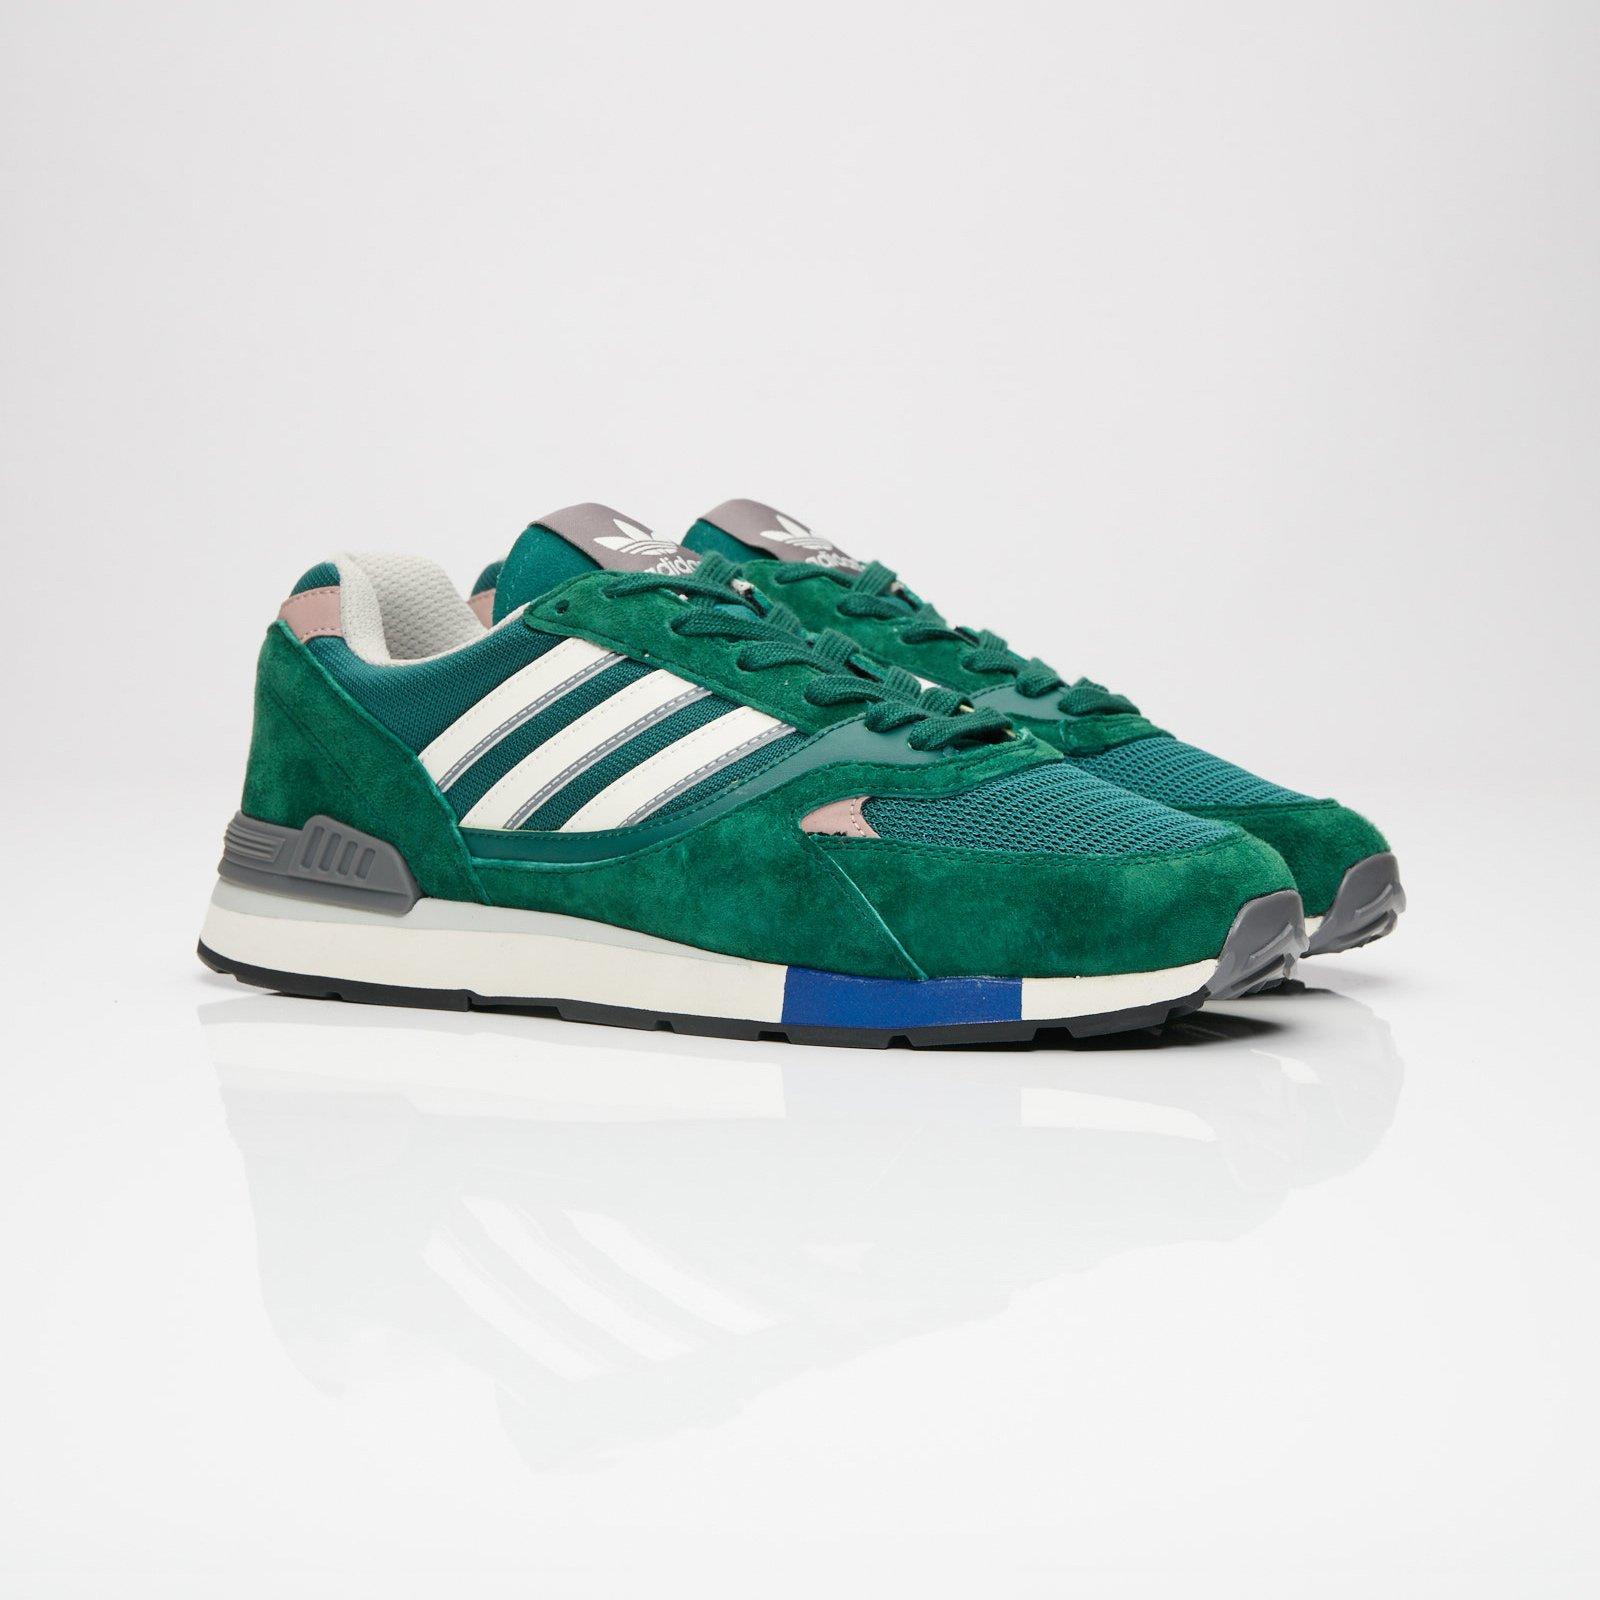 6864fbd6e07 adidas Quesence - B37851 - Sneakersnstuff